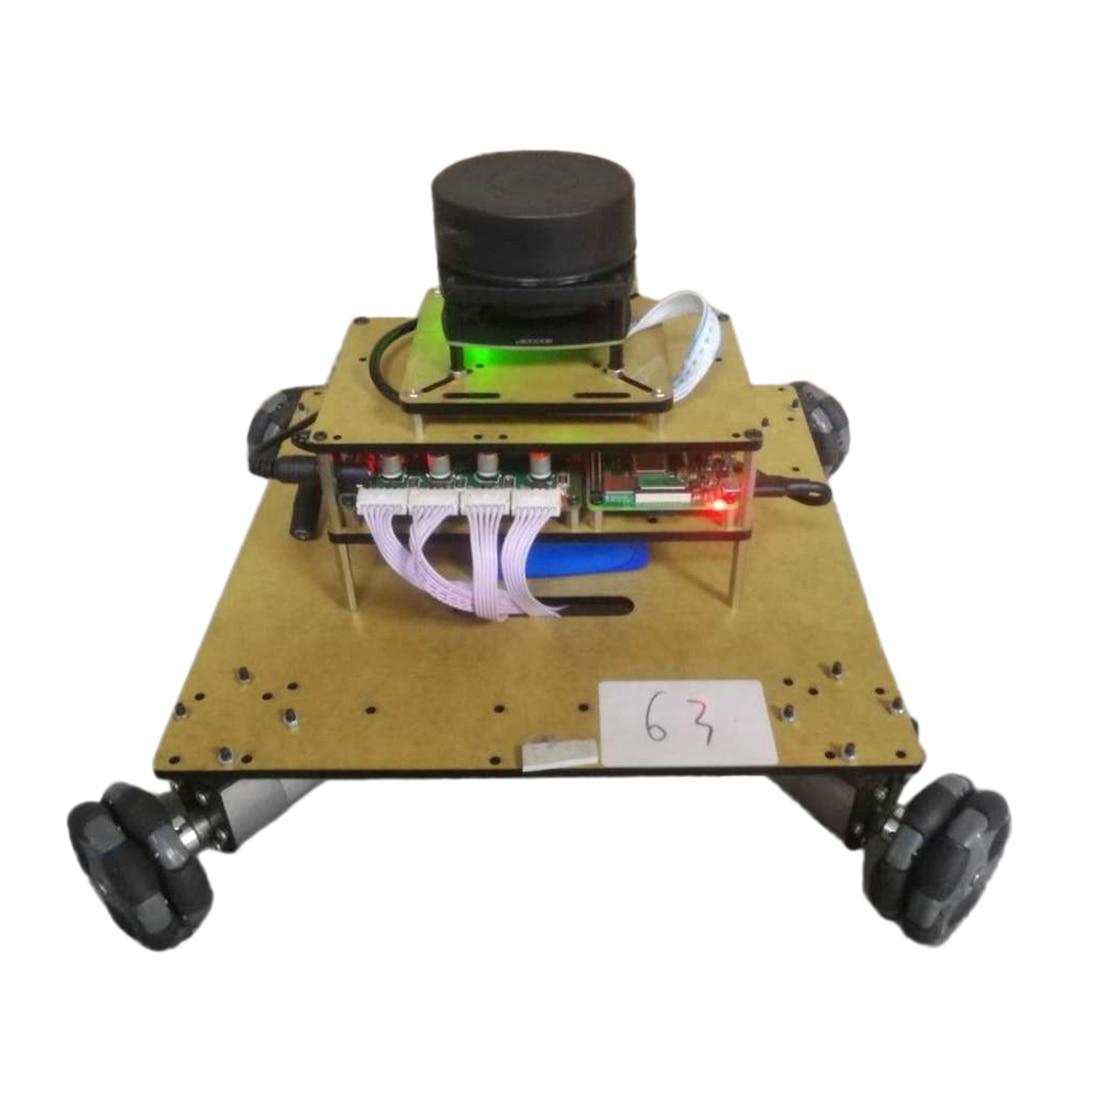 Robot Operating System Ailibot Omnidirectional Robot Car Kit - 04 Version